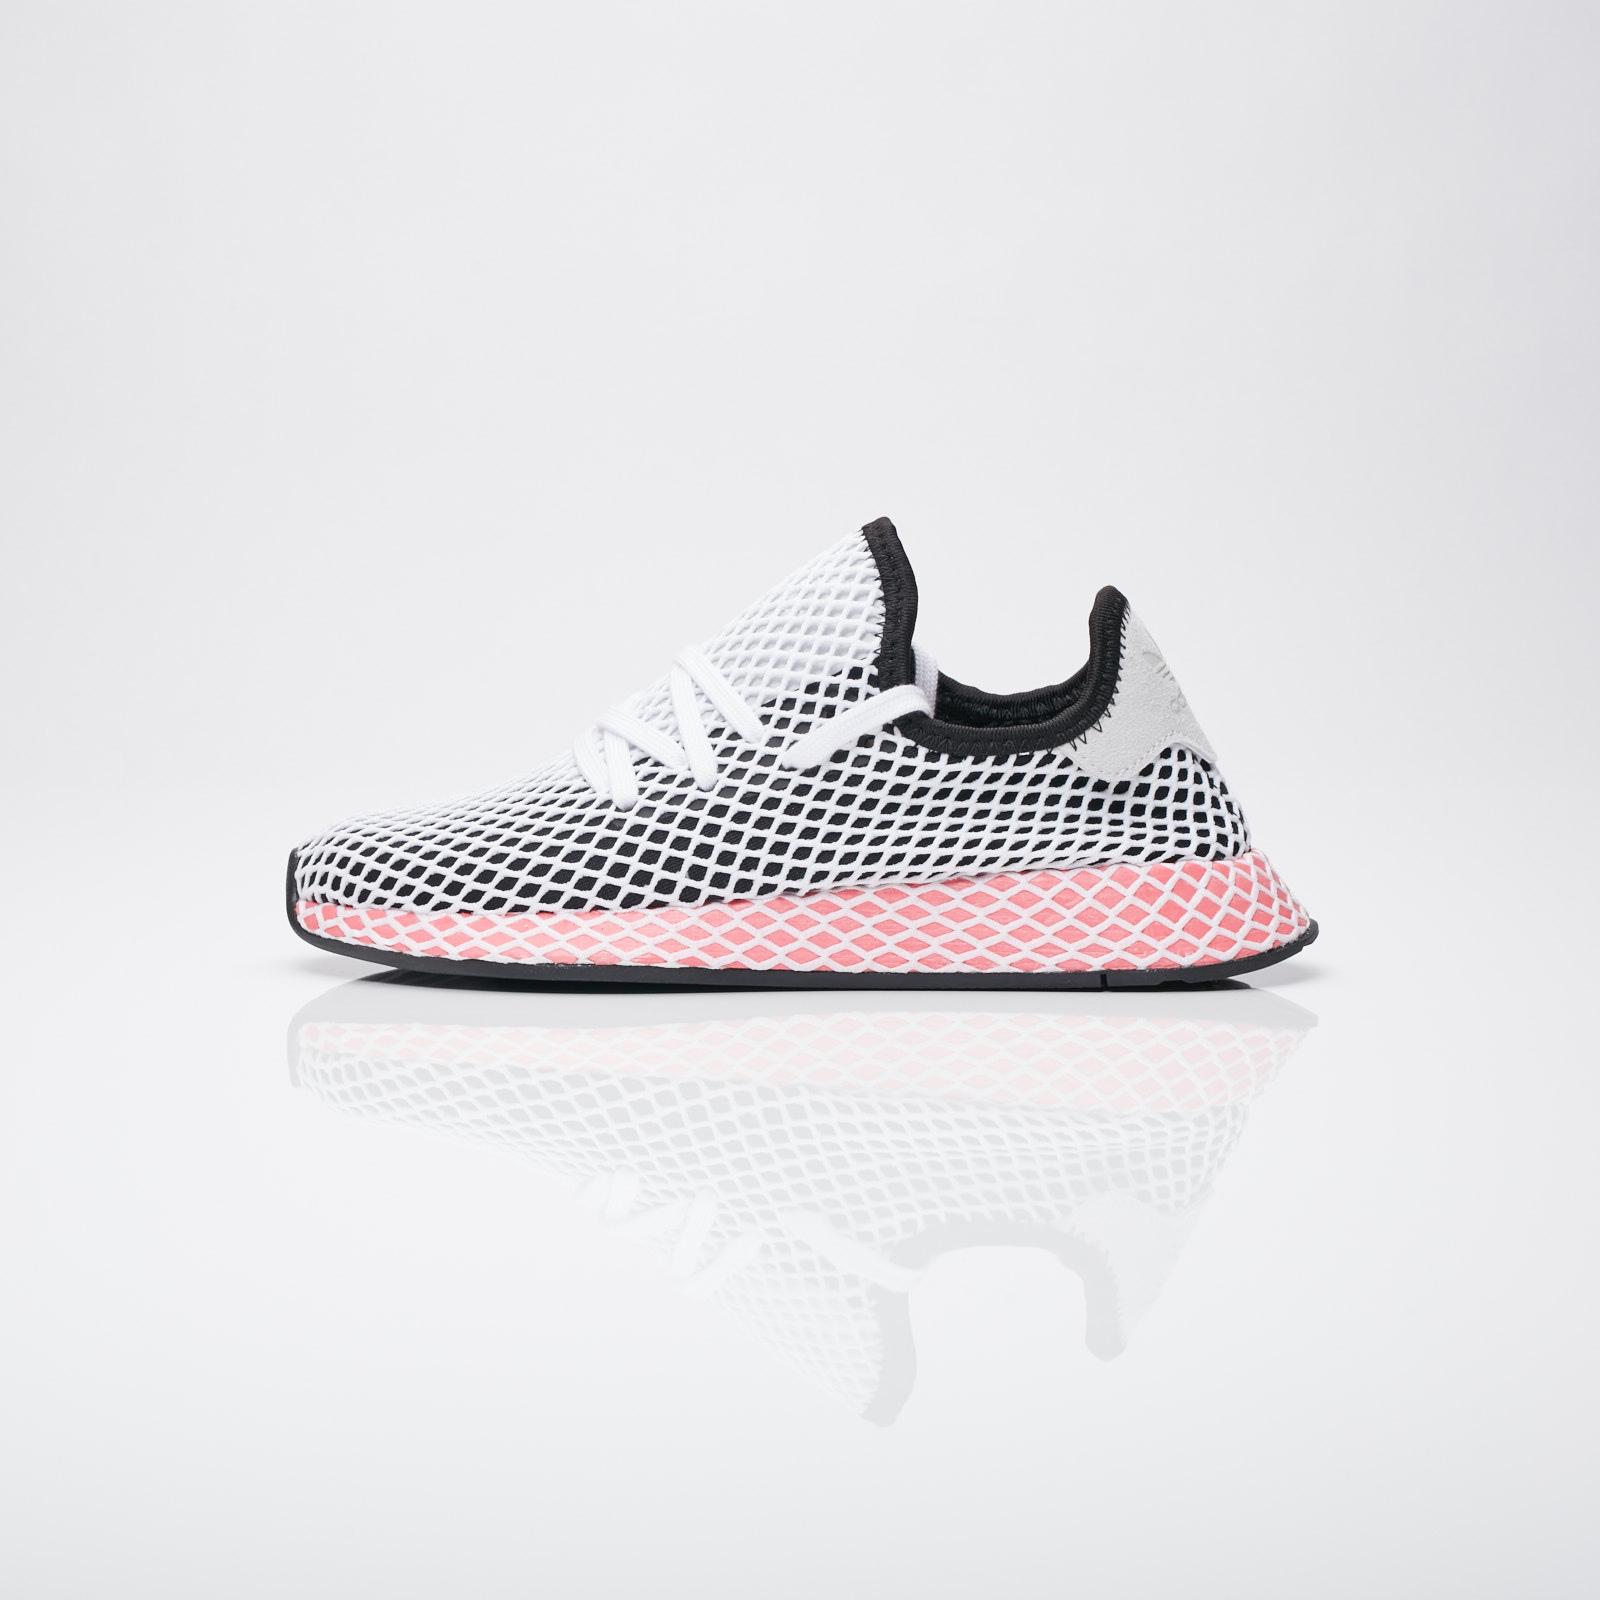 e100c3b465cfd adidas Deerupt Runner W - Cq2909 - Sneakersnstuff I Sneakers   Streetwear  online seit 1999